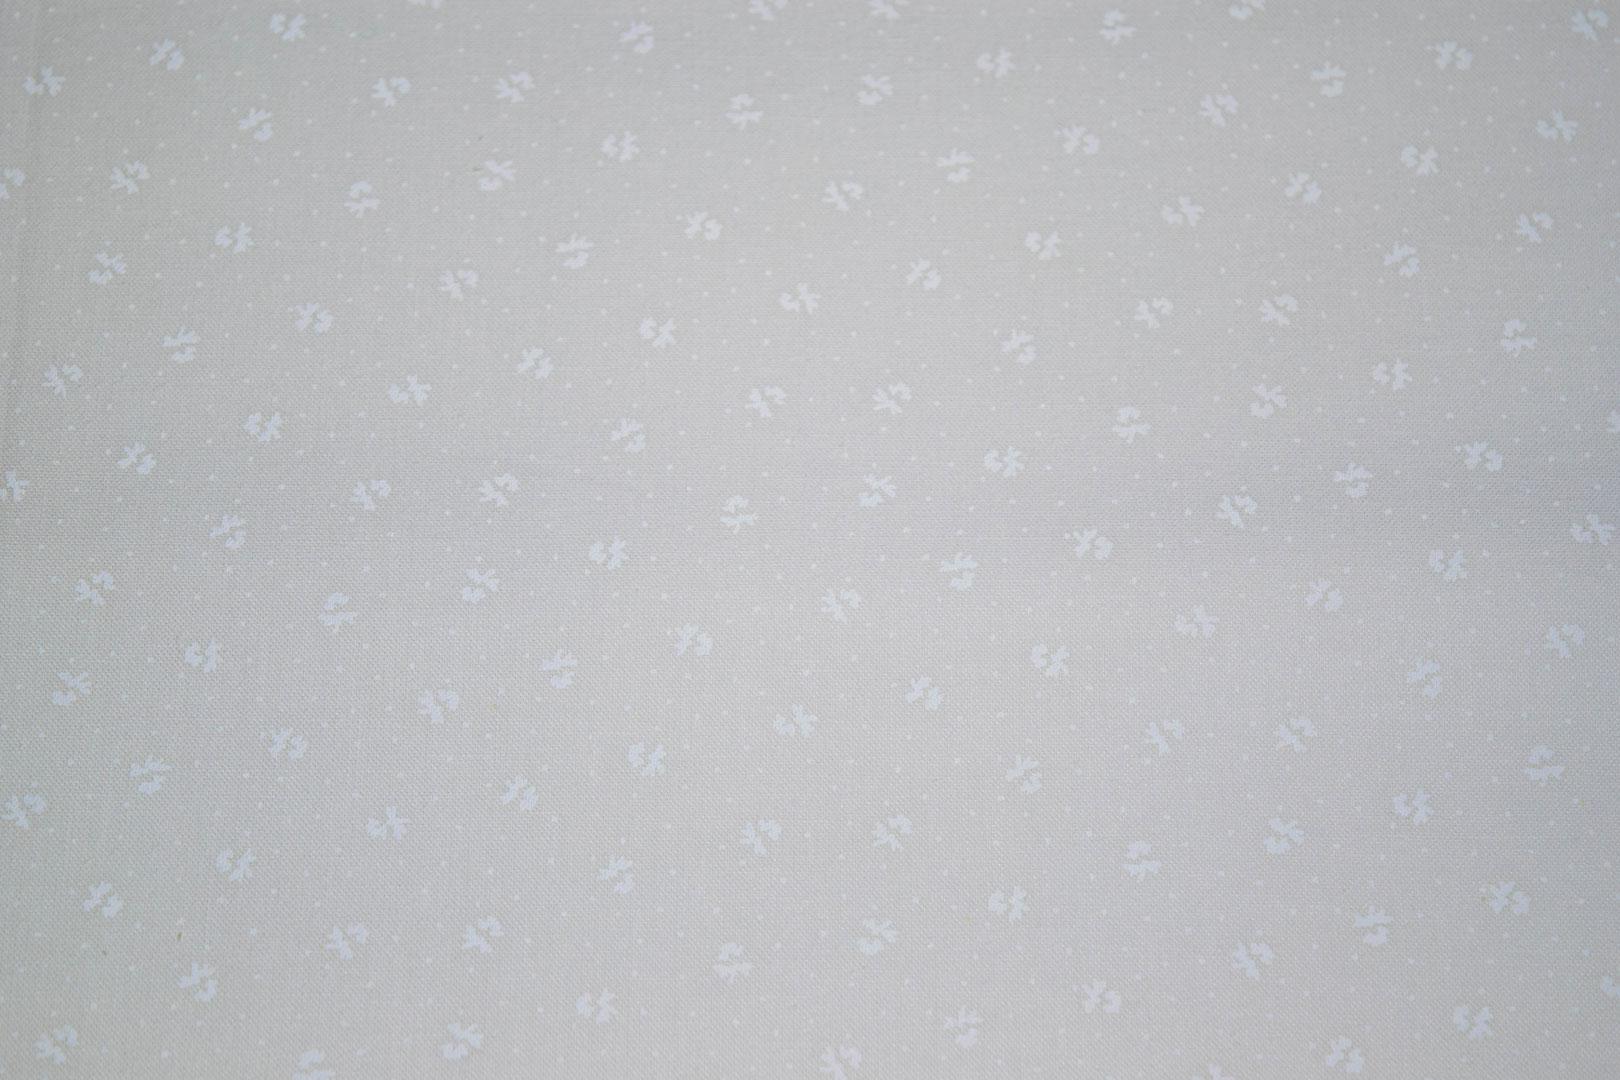 "8_17632_ww   44/45"" 68/68, 100% Carded Cotton"